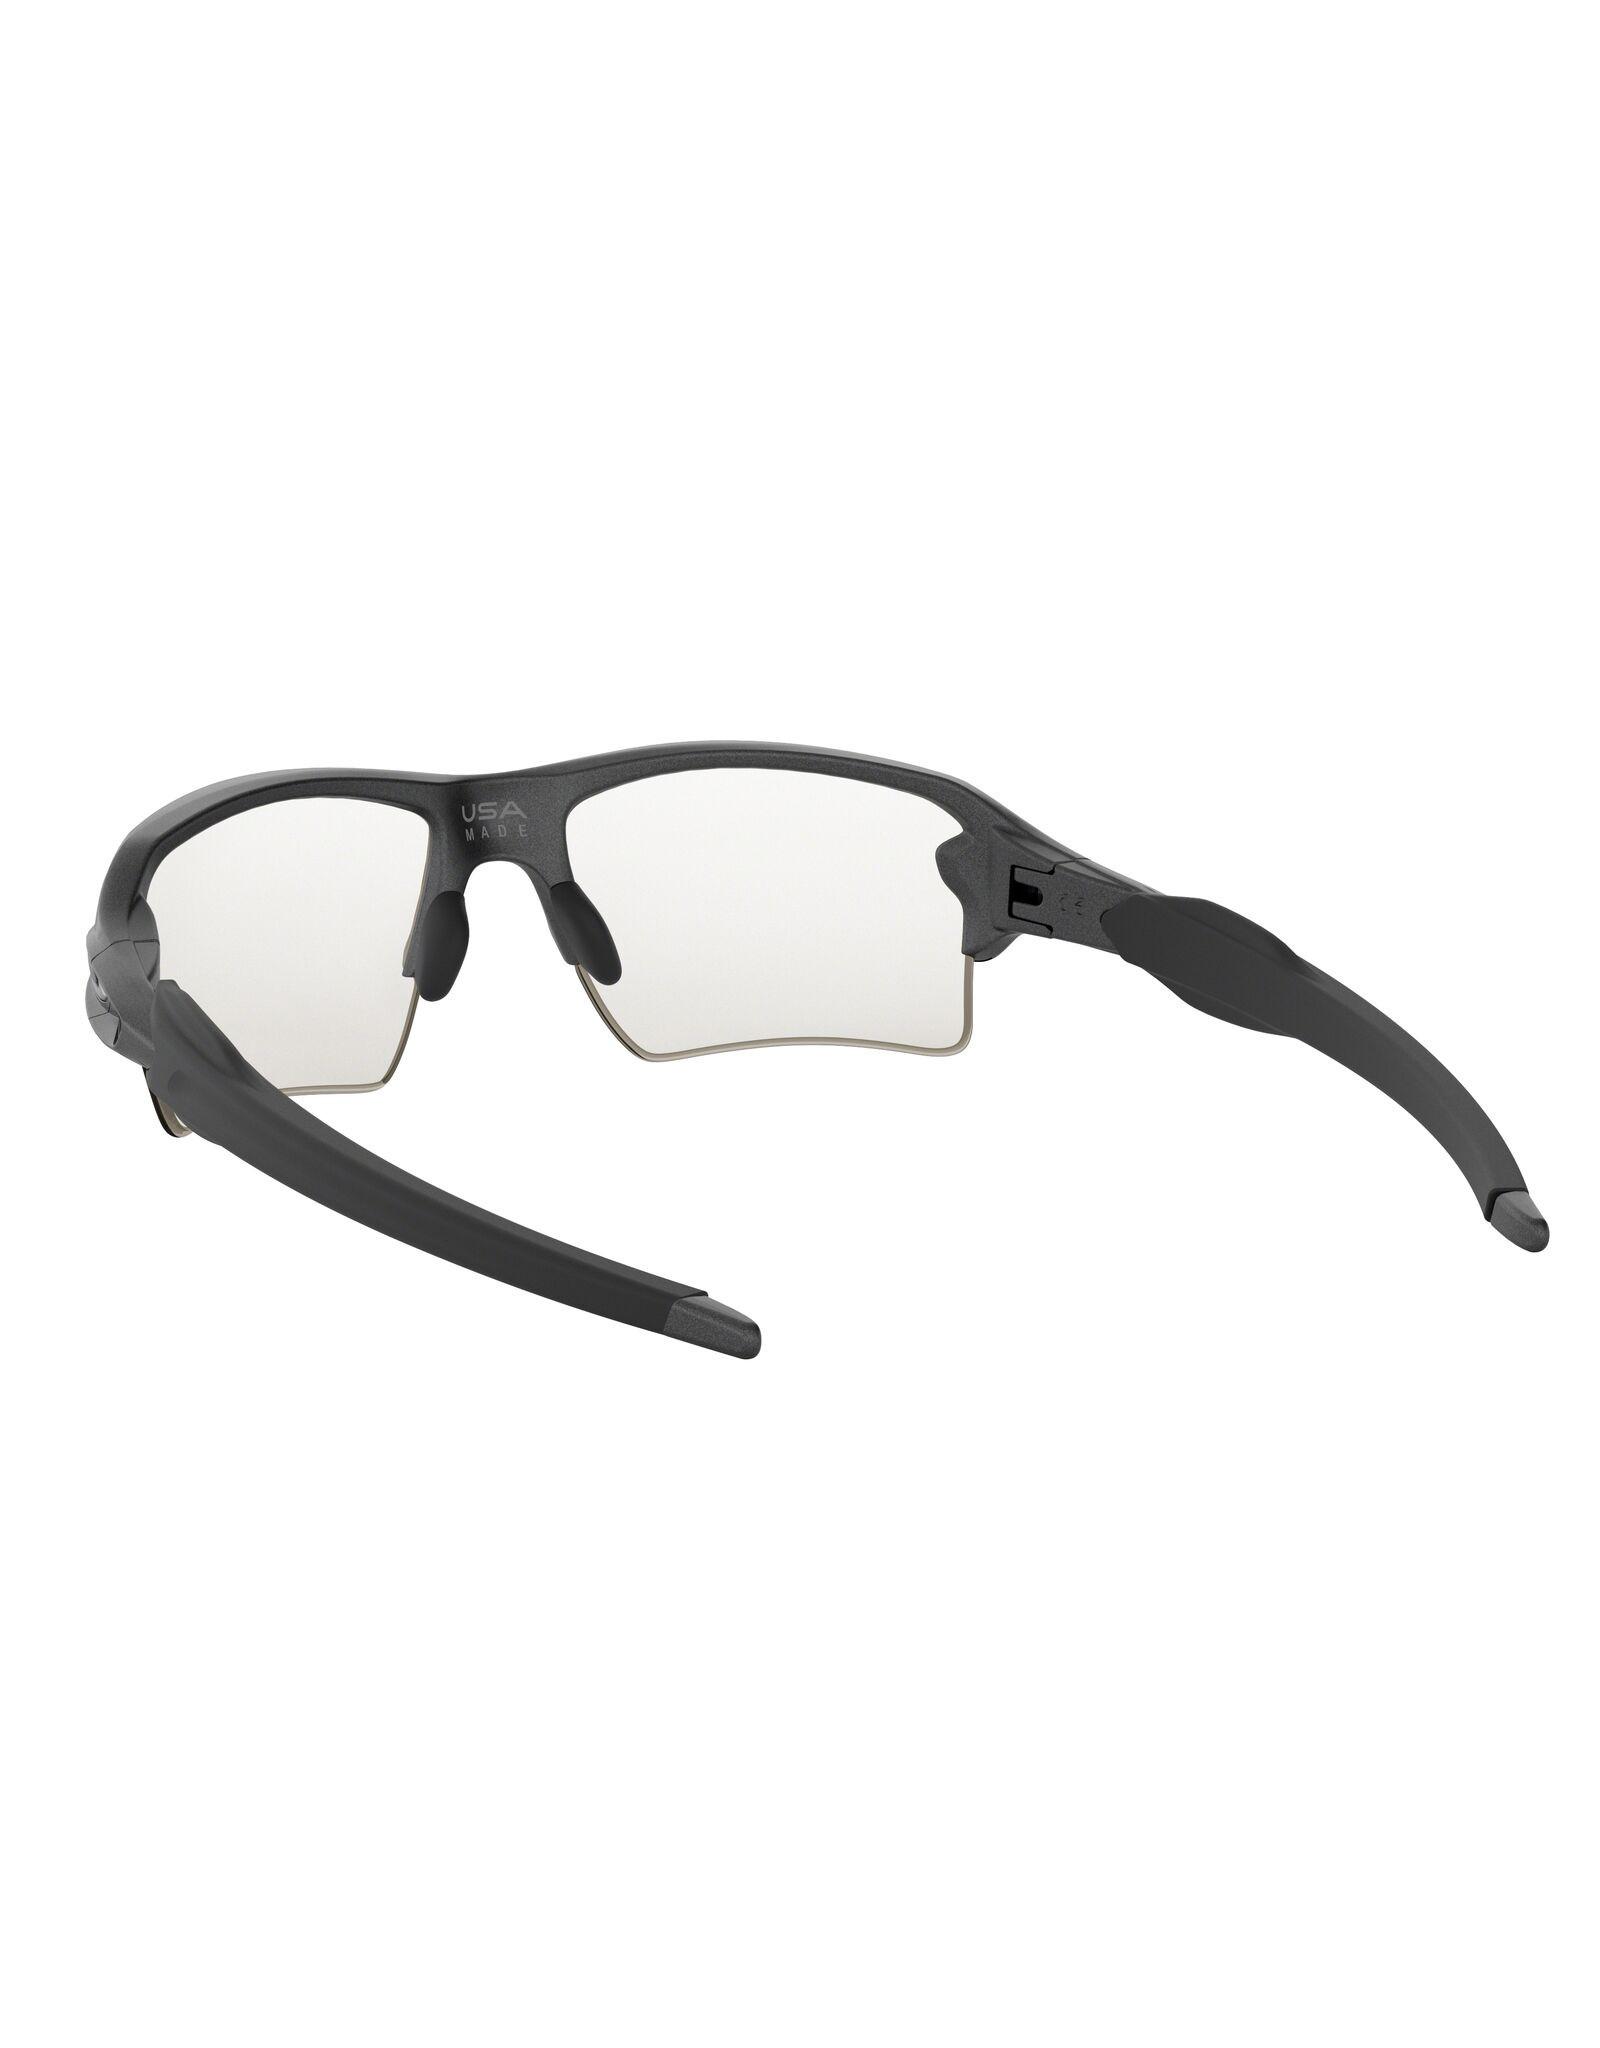 Oakley Lunettes OAKLEY Flak 2.0 XL Steel w/Clear to Black Iridium Photochromic